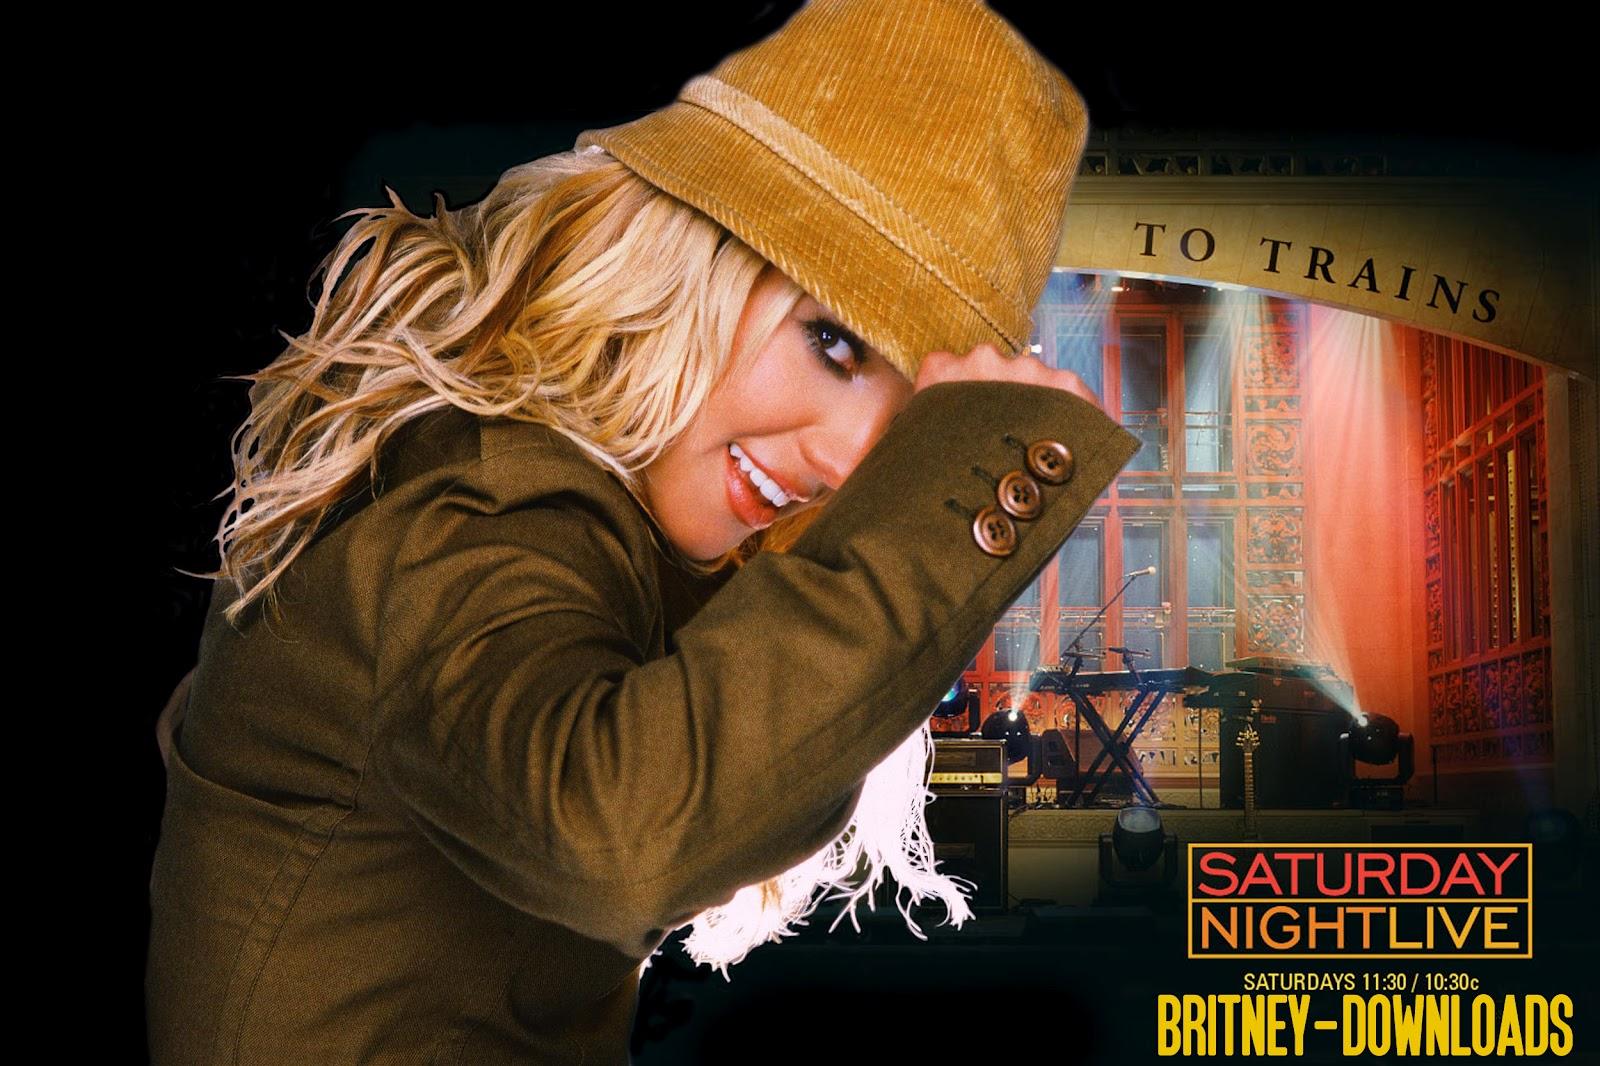 http://1.bp.blogspot.com/-s04mzah_7Wk/T-w3fN53MMI/AAAAAAAABlM/Gv4IJH778Js/s1600/BritneySpears_MaryEllenMatthews2002_SaturdayNightLive_07.jpg